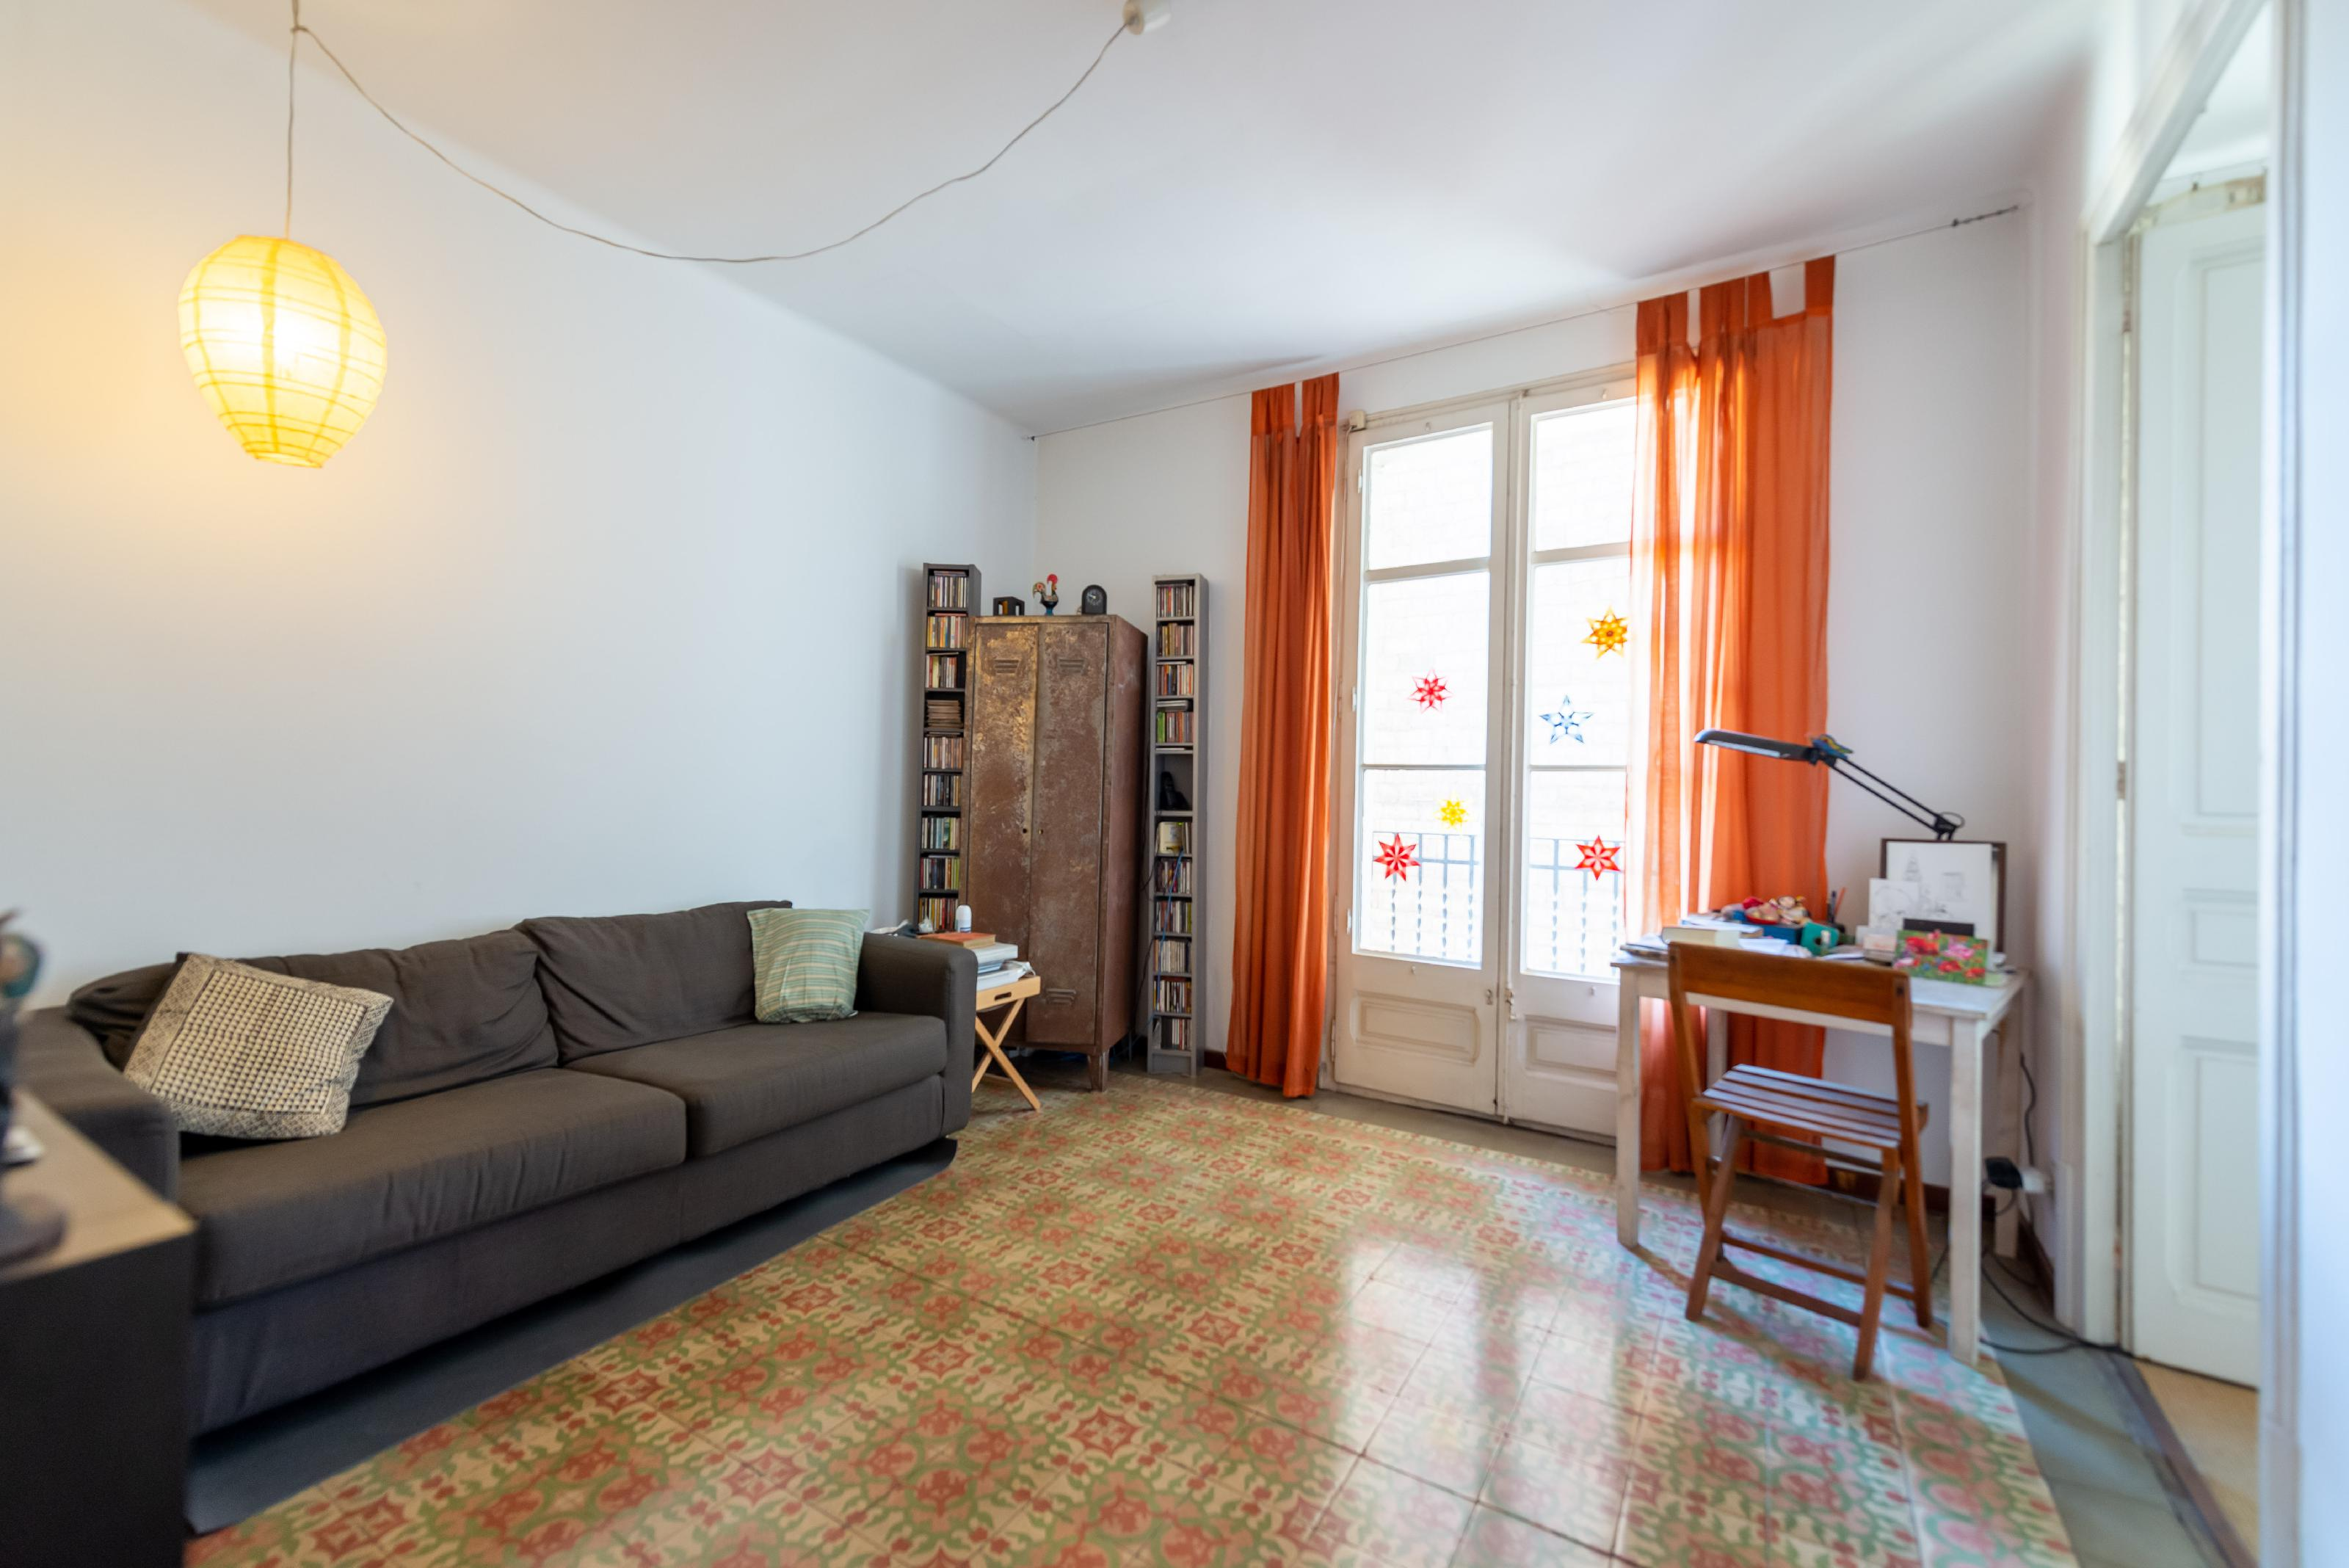 250582 Flat for sale in Sarrià-Sant Gervasi, Sant Gervasi-Galvany 13